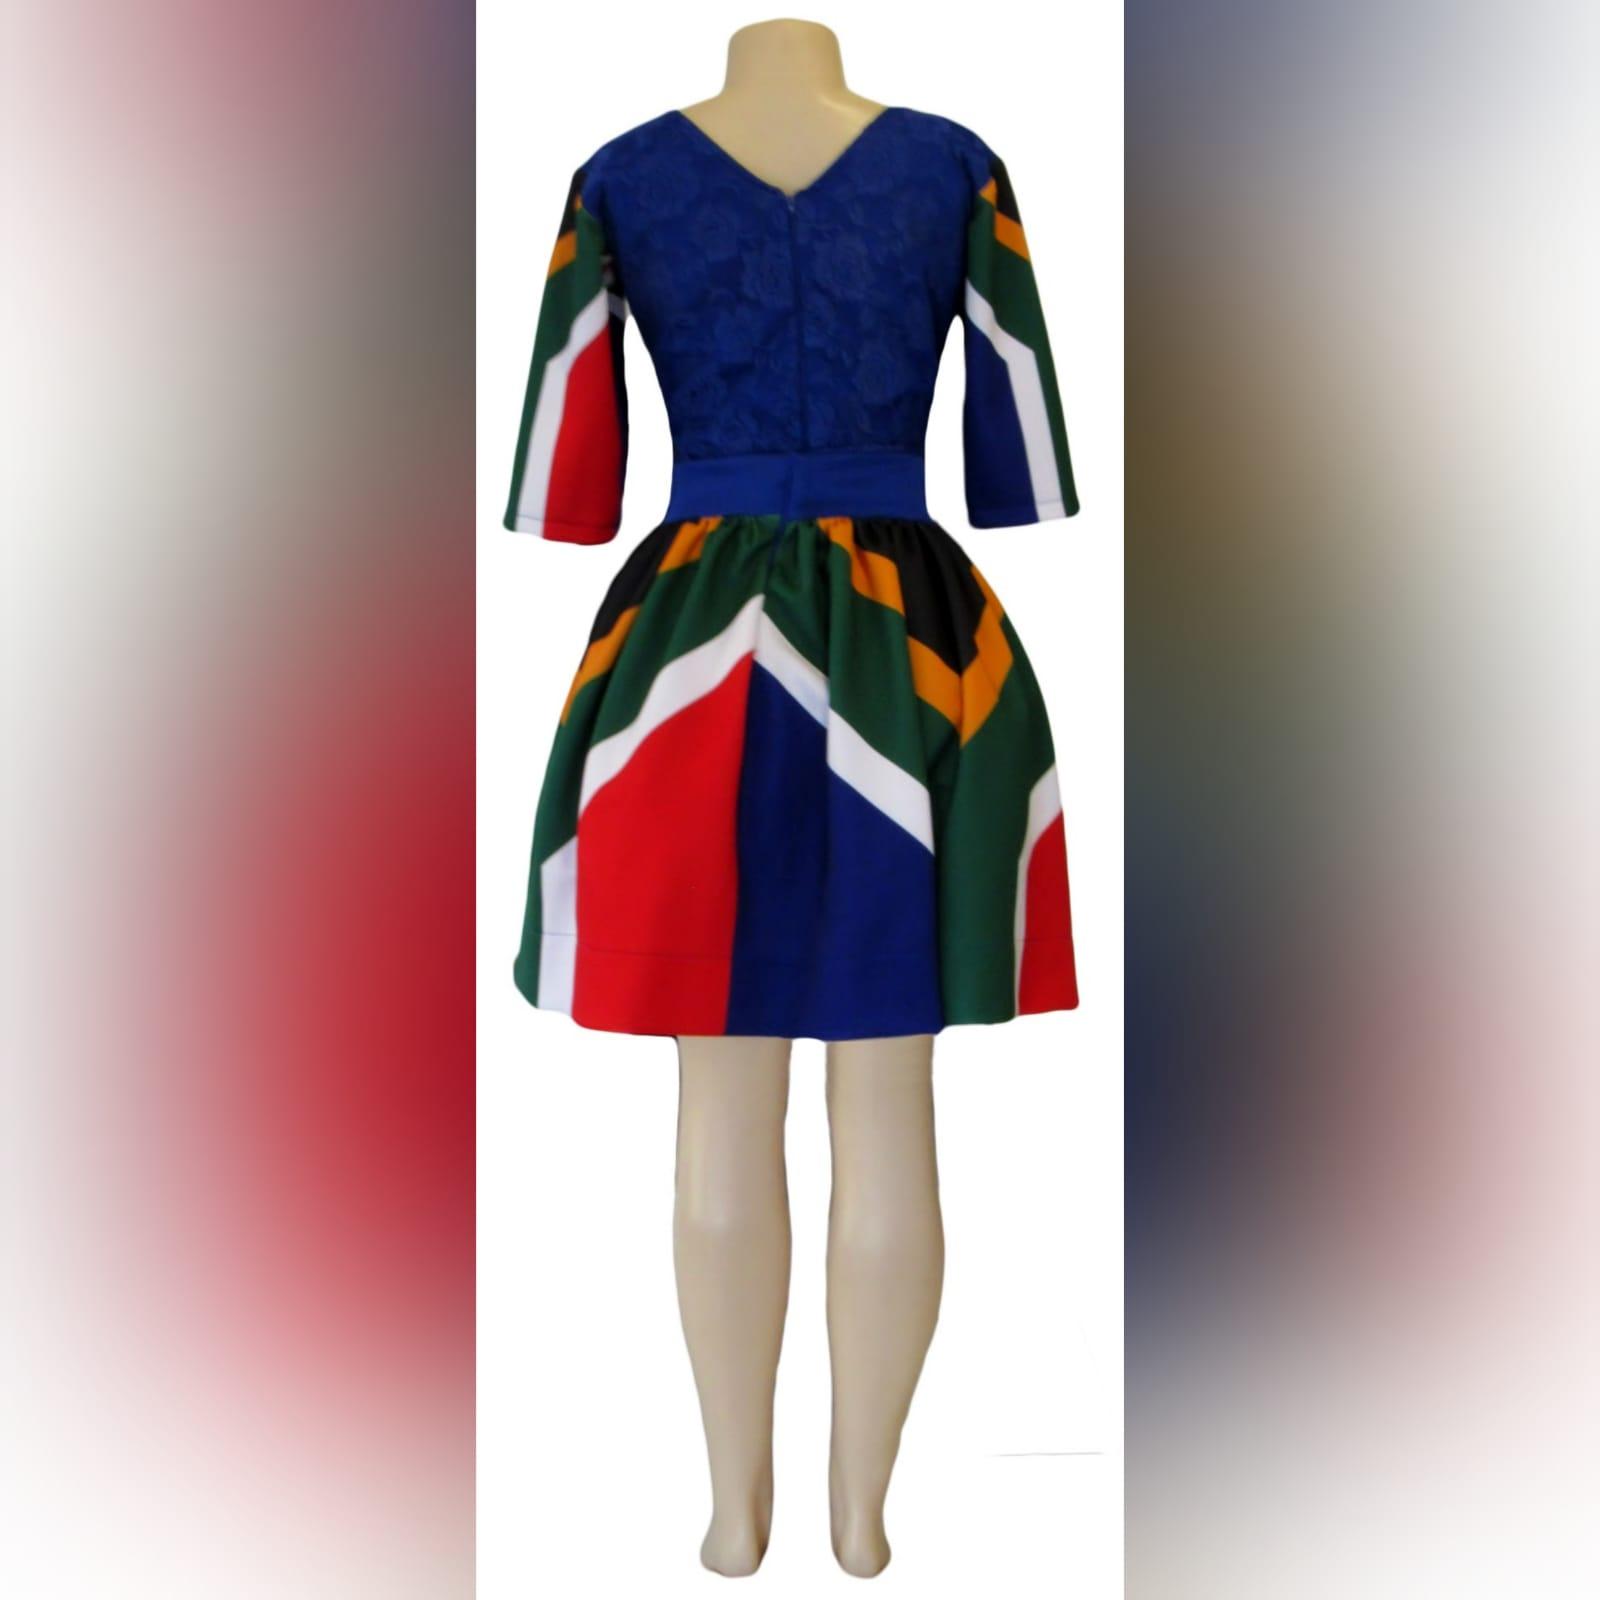 Royal blue sa flag short traditional dress 6 royal blue sa flag short traditional dress. With sa flag sleeves and a lace bodice. Traditional dress for graduation.